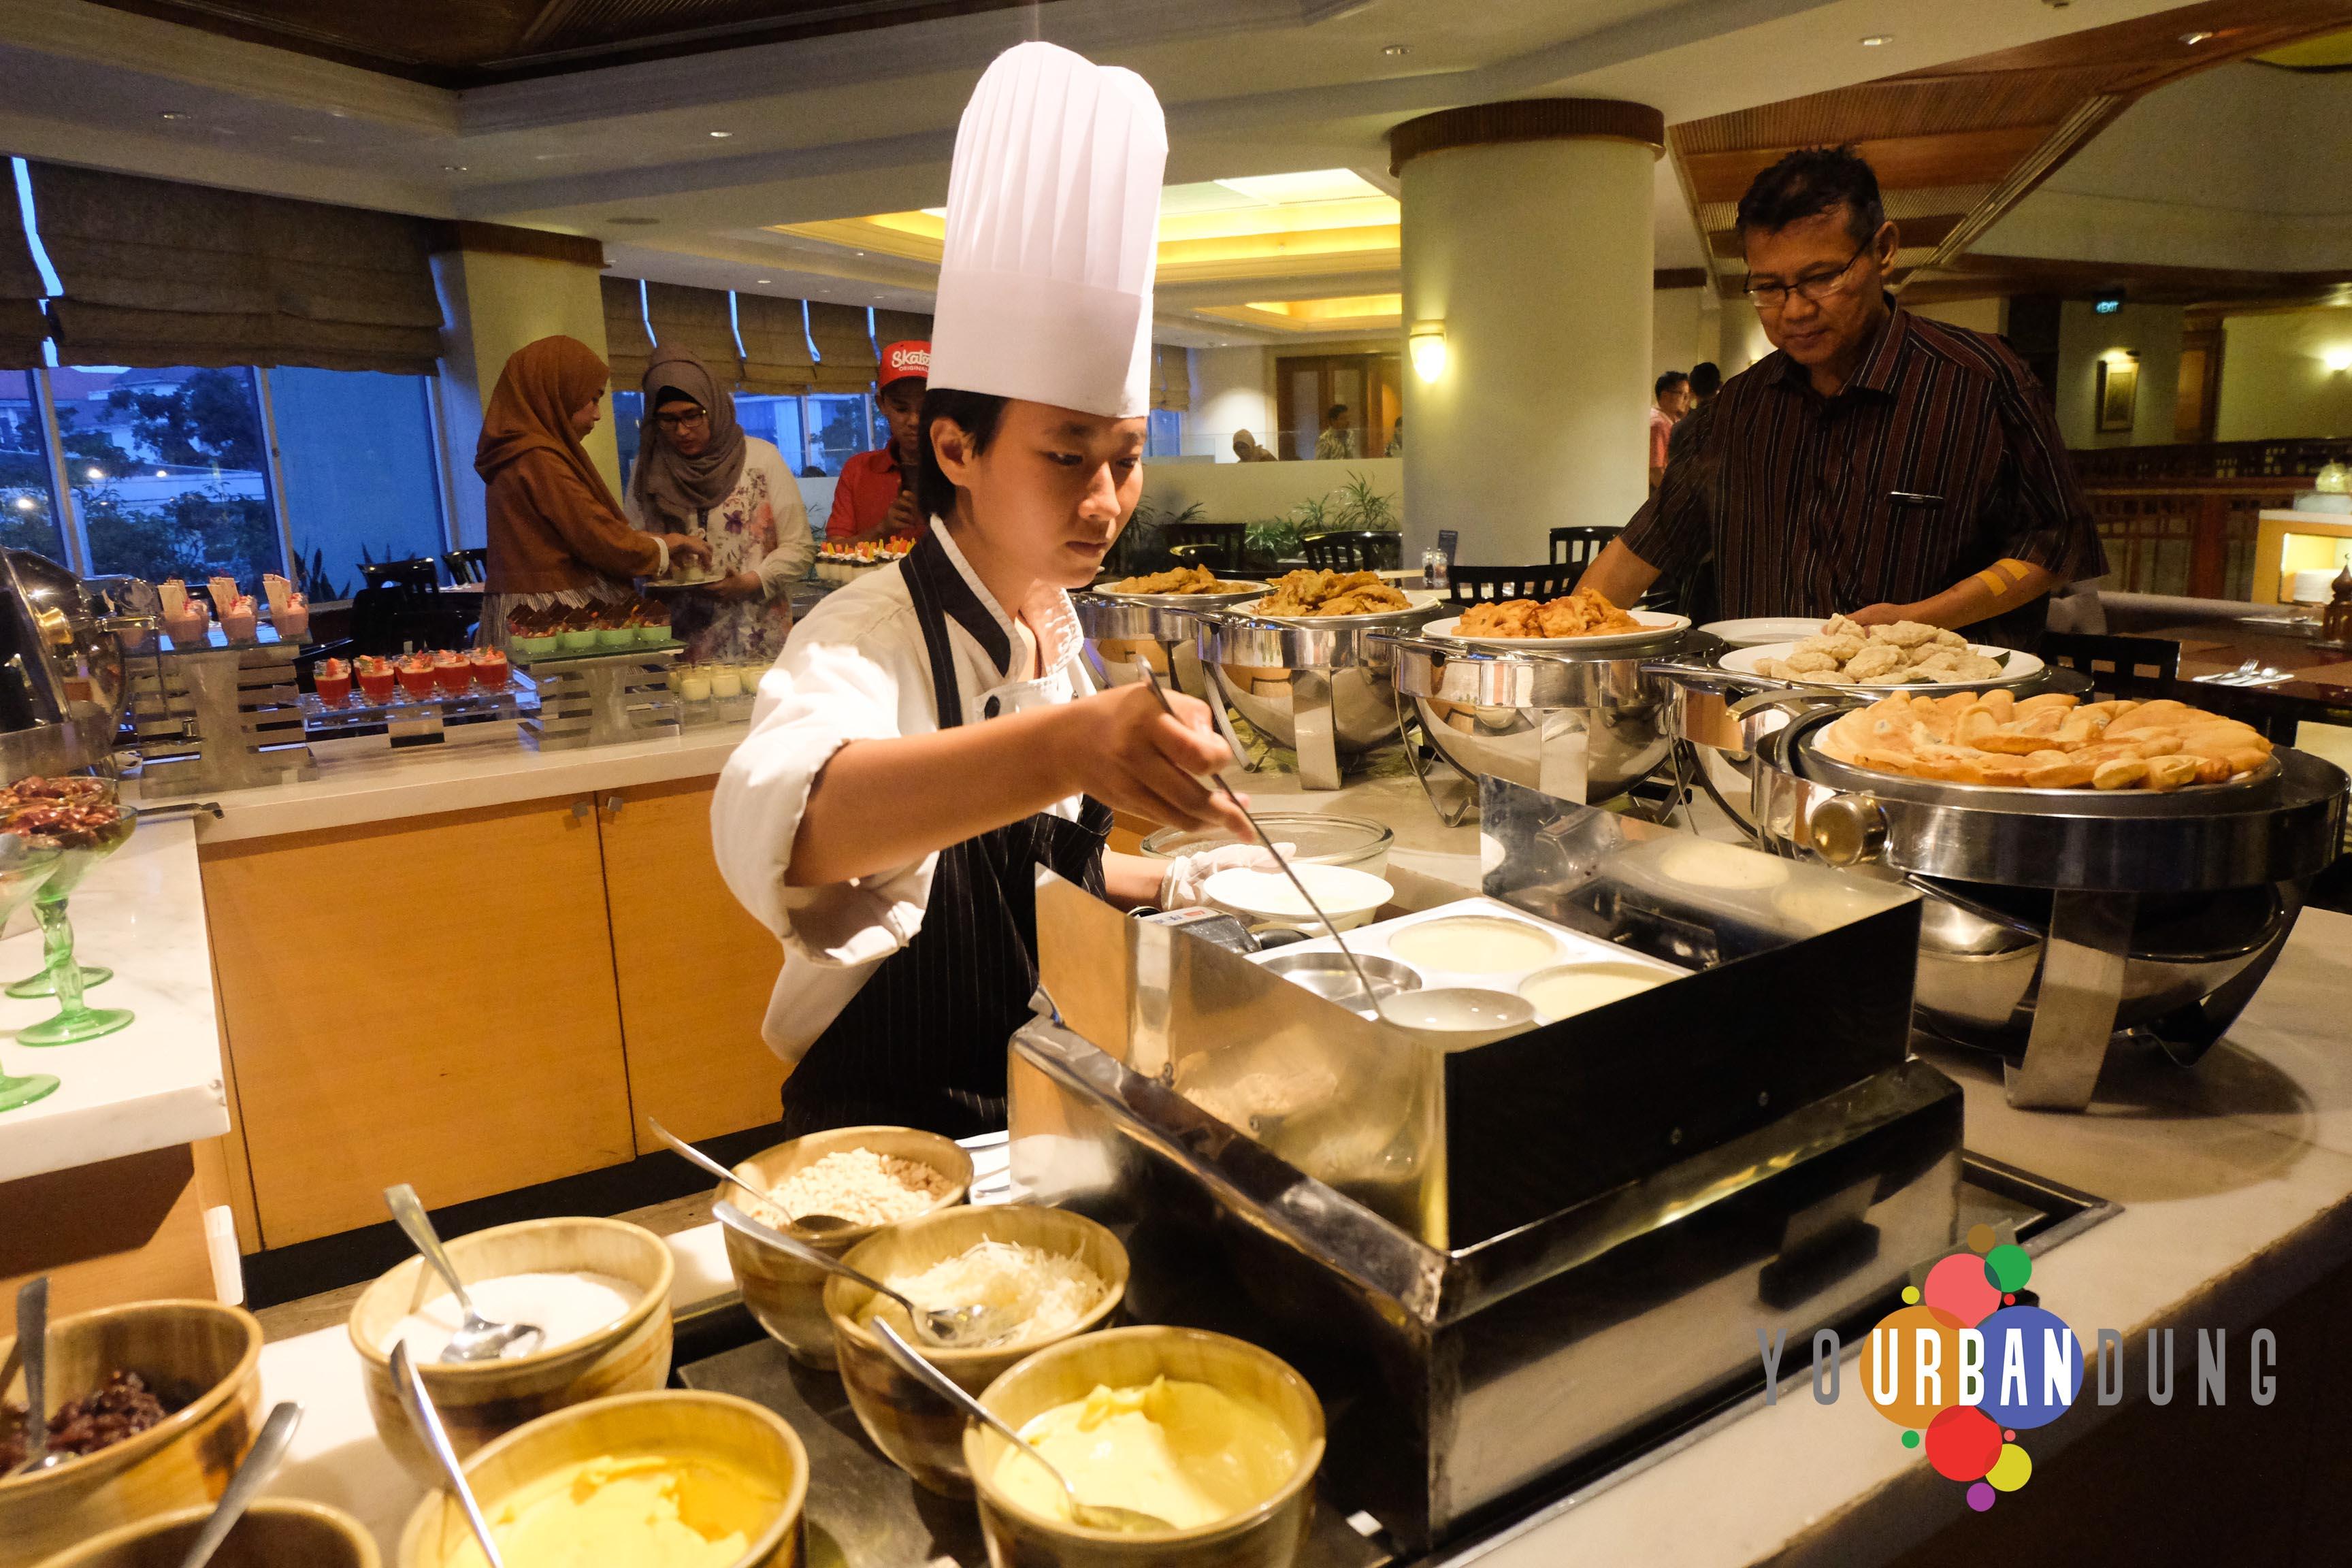 Pojok makanan Indonesia